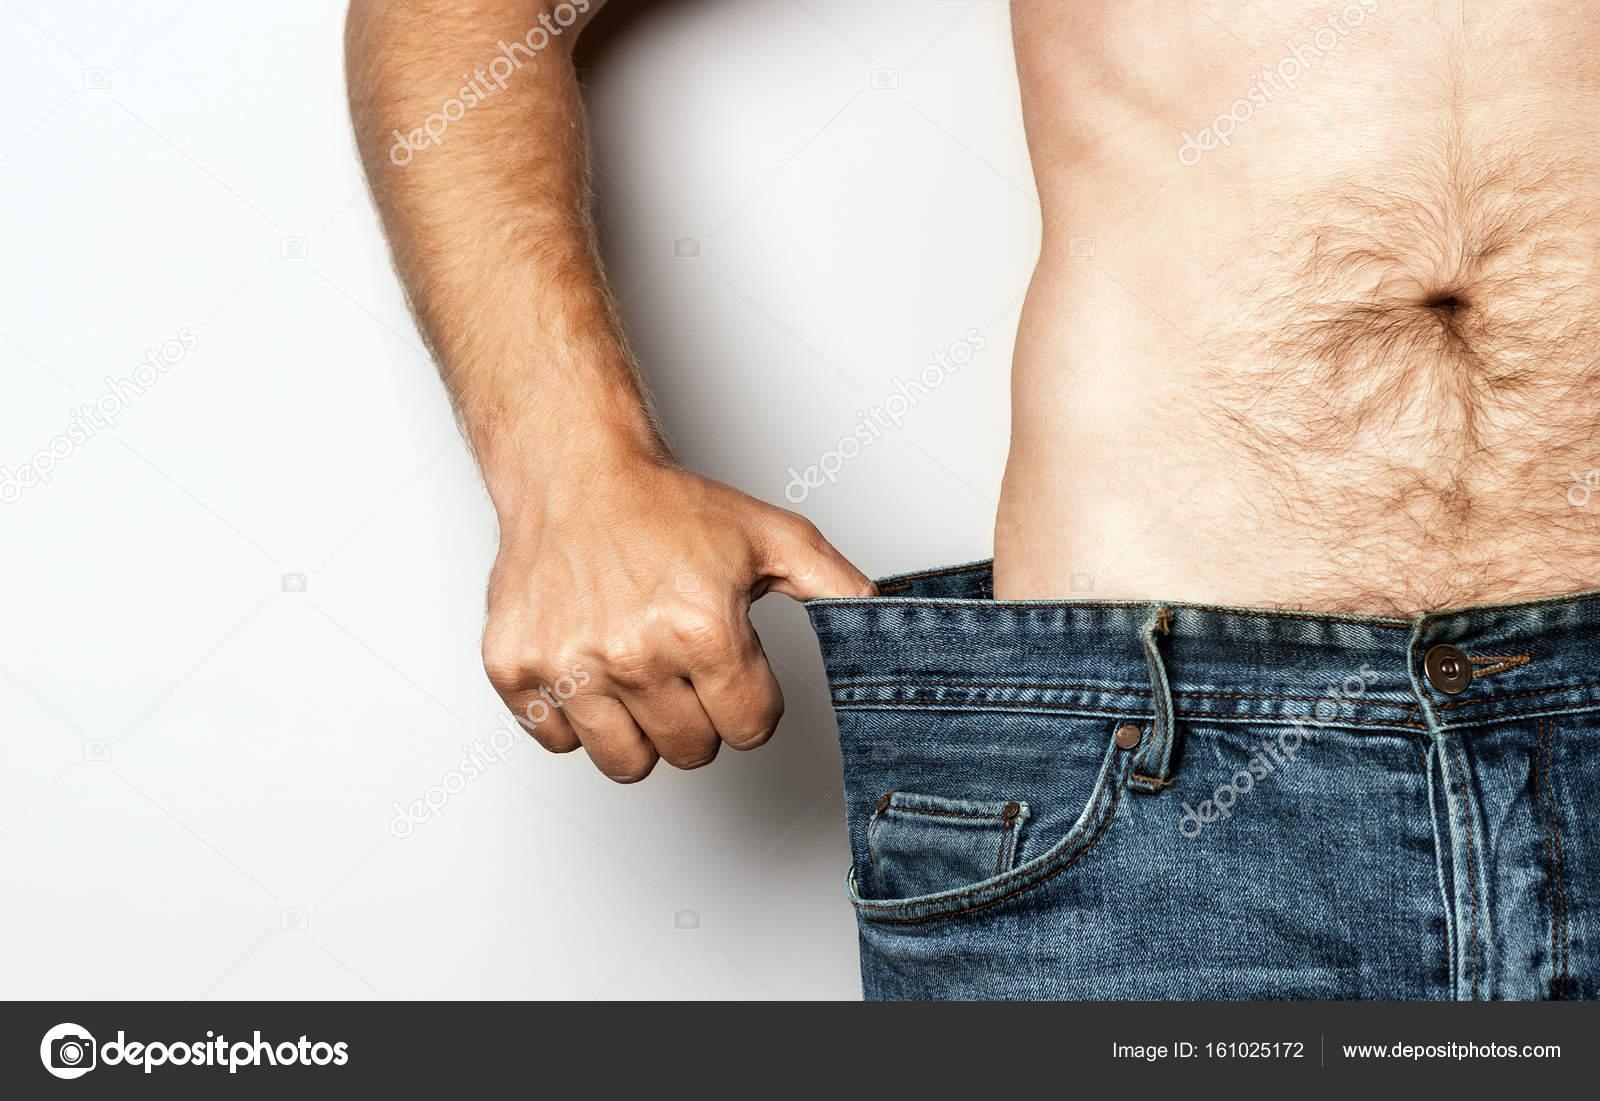 Dieta para baixar peso